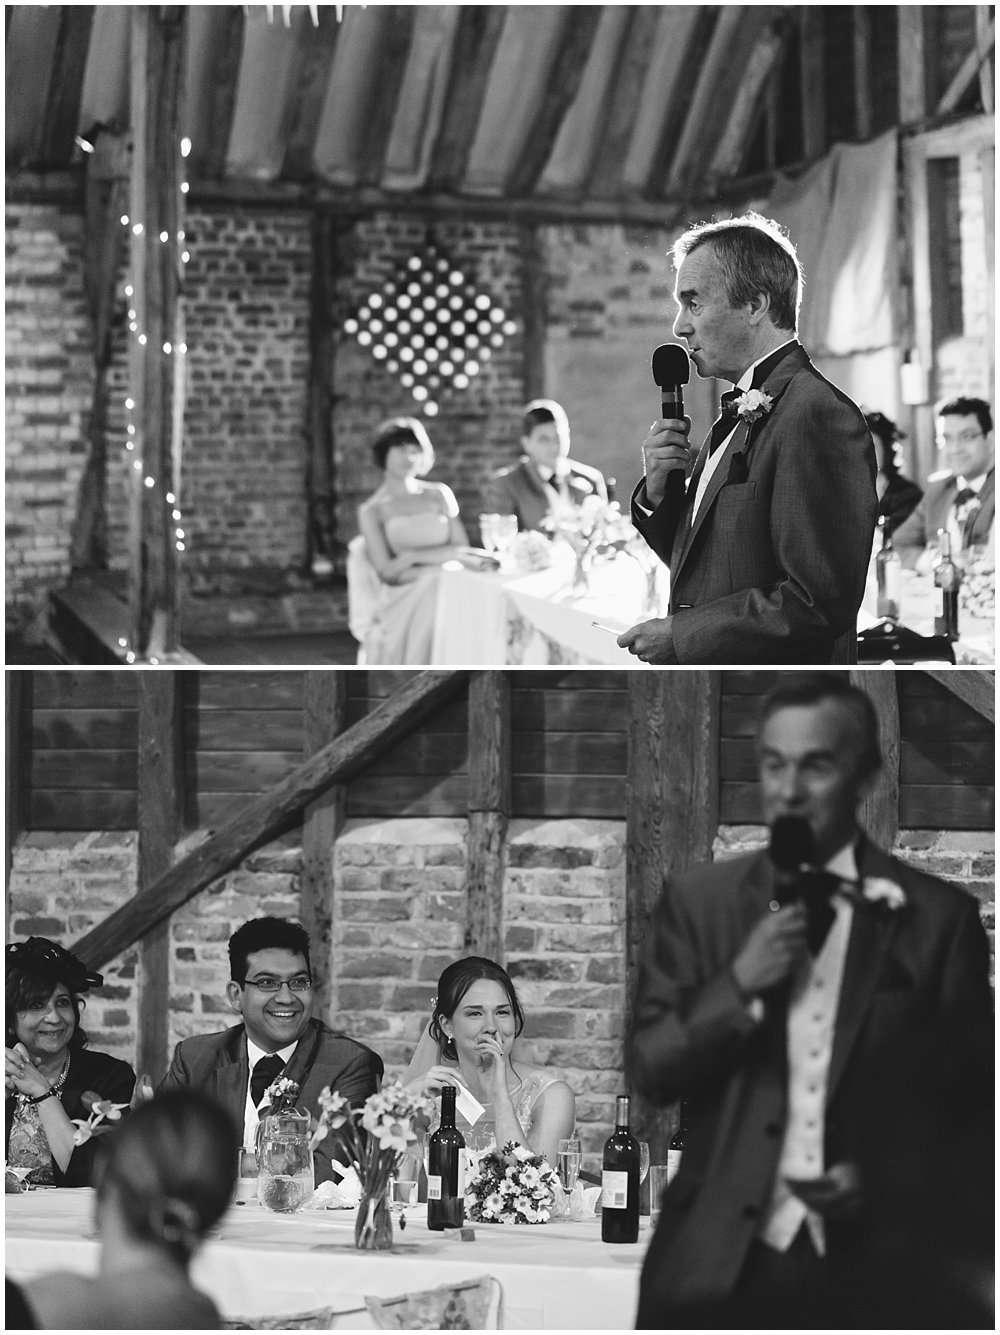 CHLOE AND JAIMIN RED BARN WEDDING - NORFOLK WEDDING PHOTOGRAPHER 1